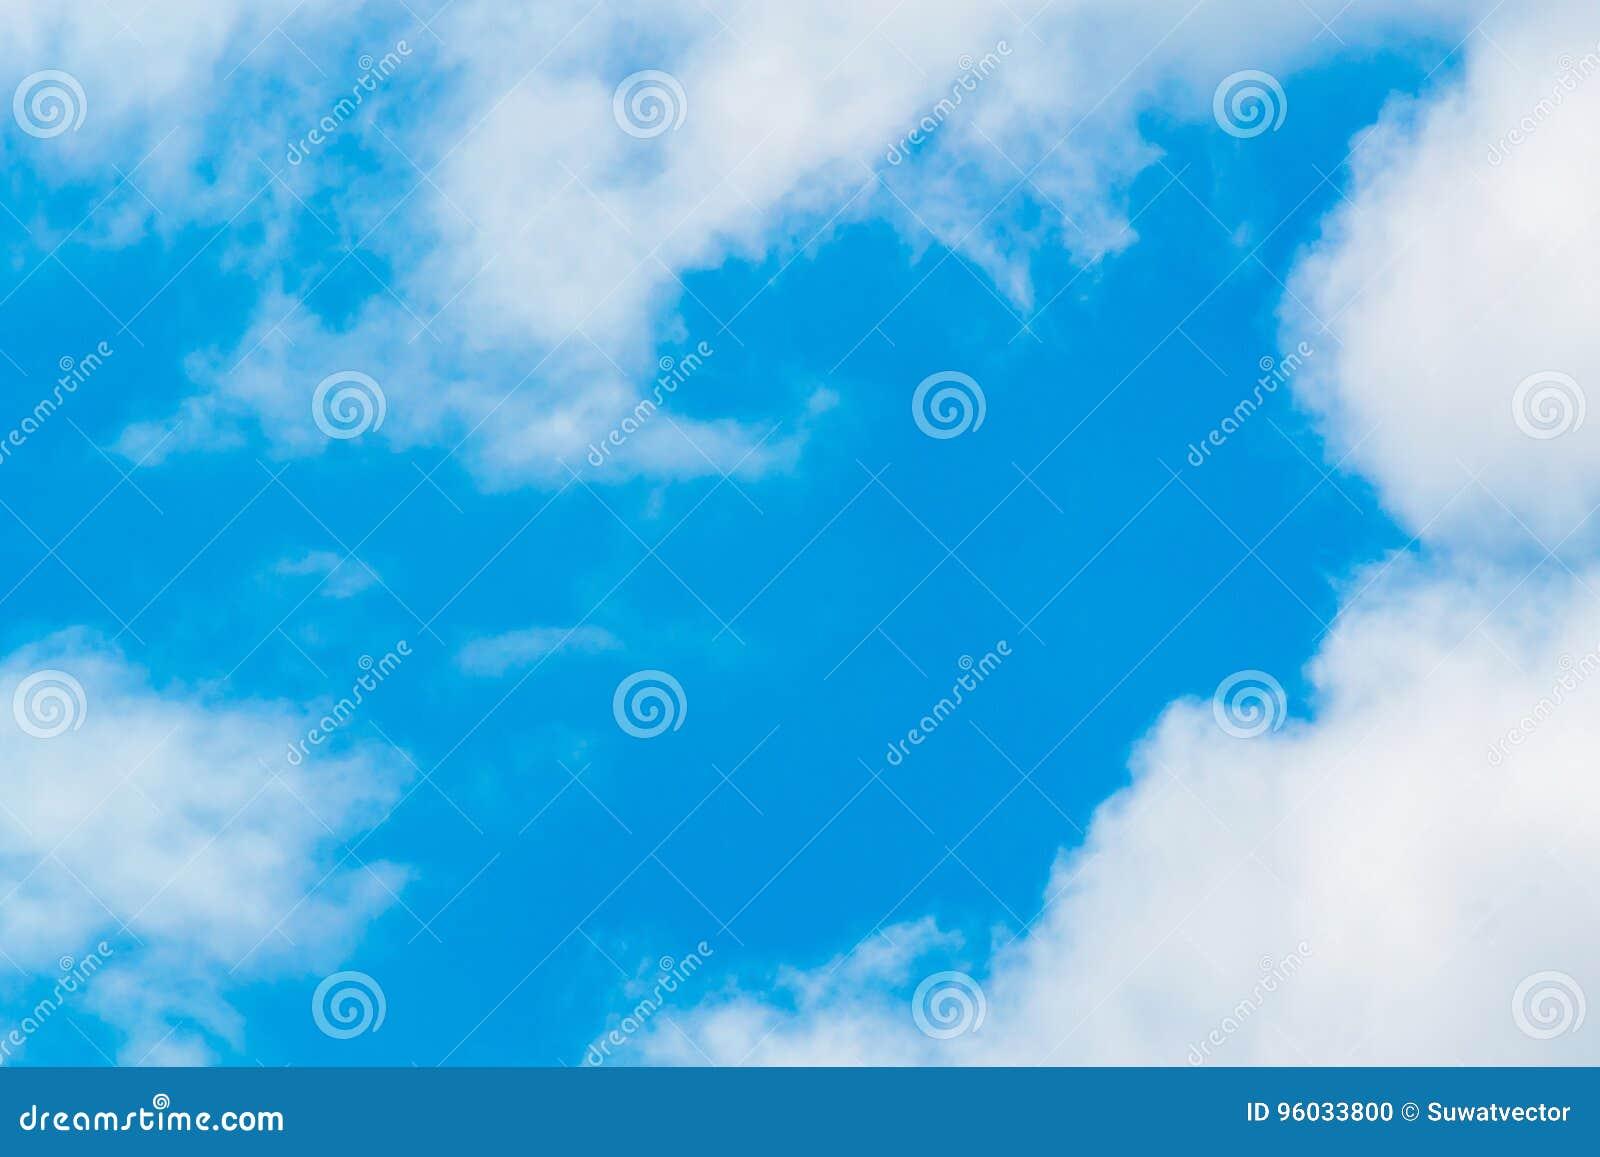 Duże chmury